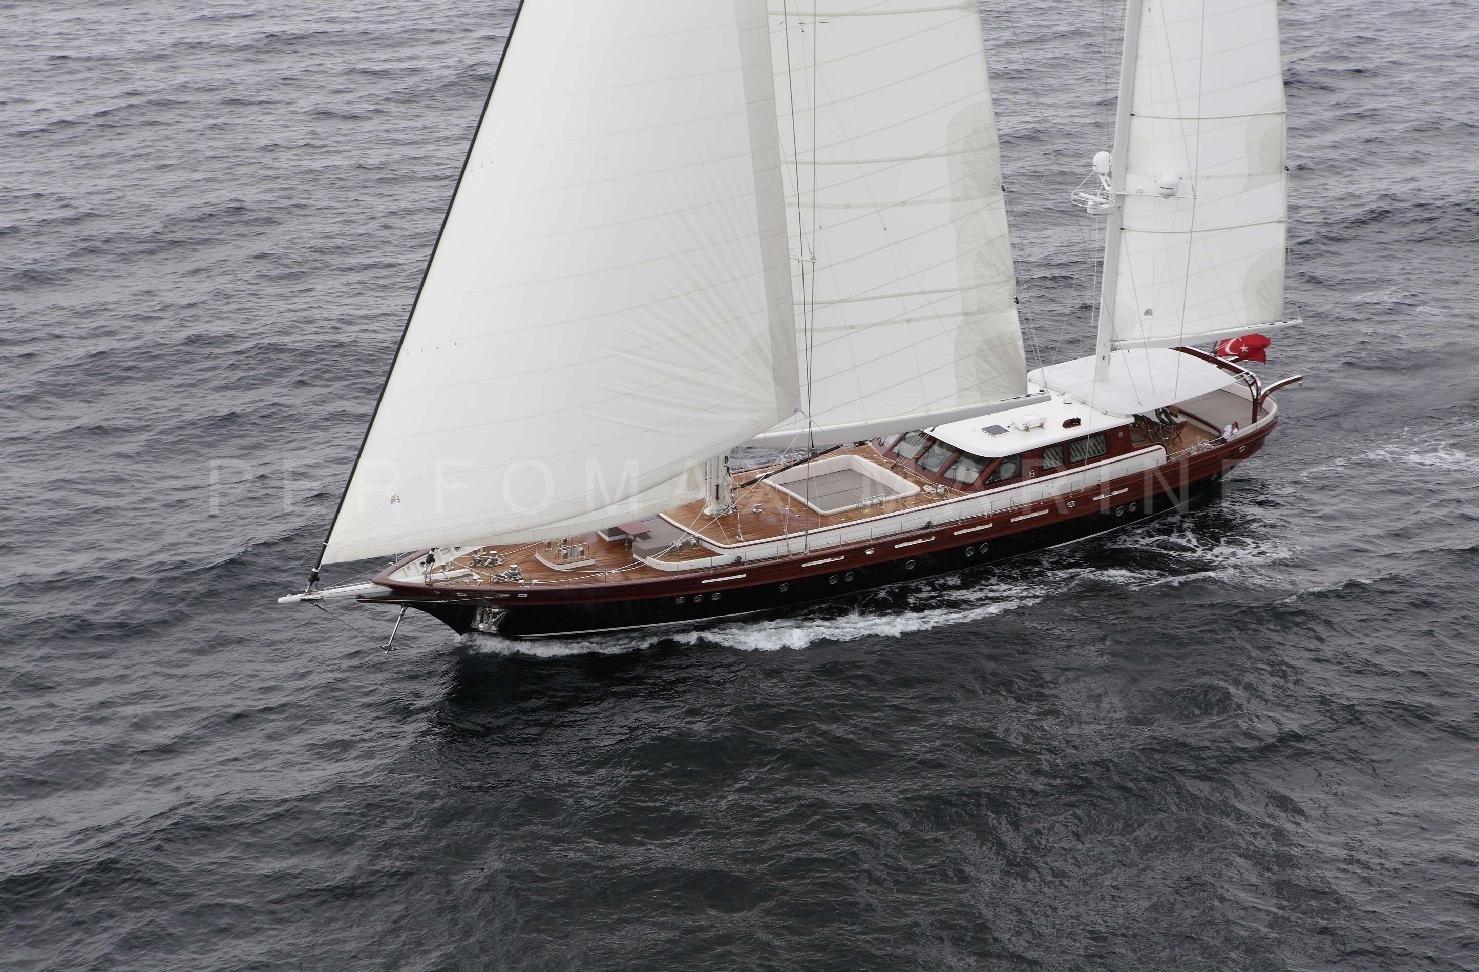 2013 Su_Yachts_40M_Gulet-1_page27_image1